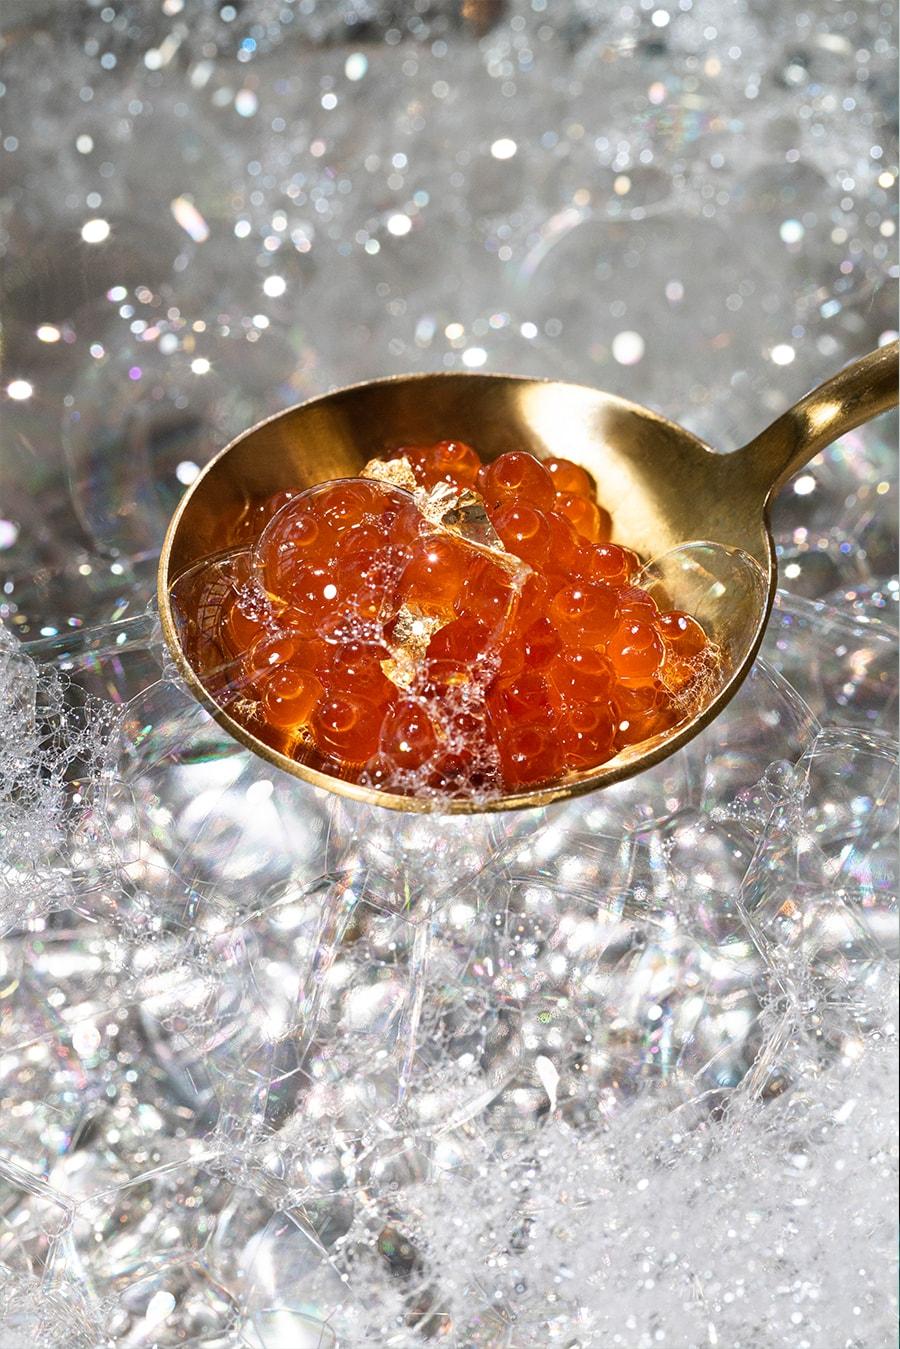 Research:  去藝術館不如去吃飯?Alison Tan 重新想像亞洲菜色的可能性